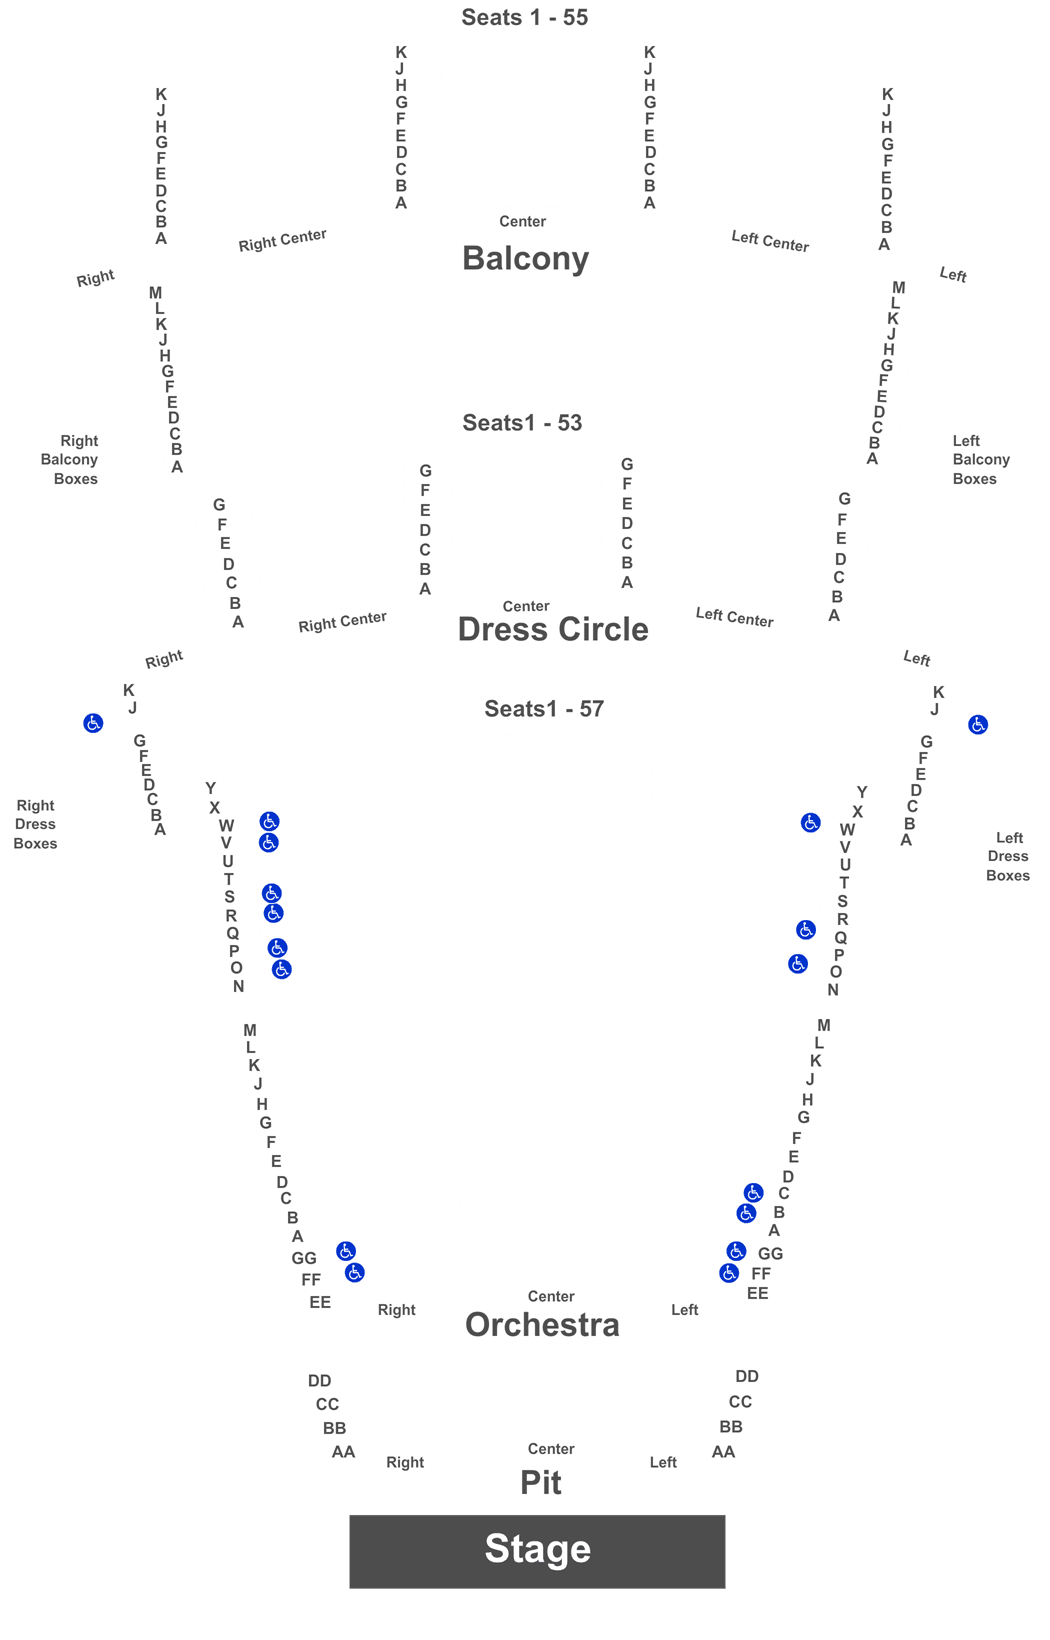 reykjavik concert and architects harpa henning hall conference larsen centre firms in chrysler